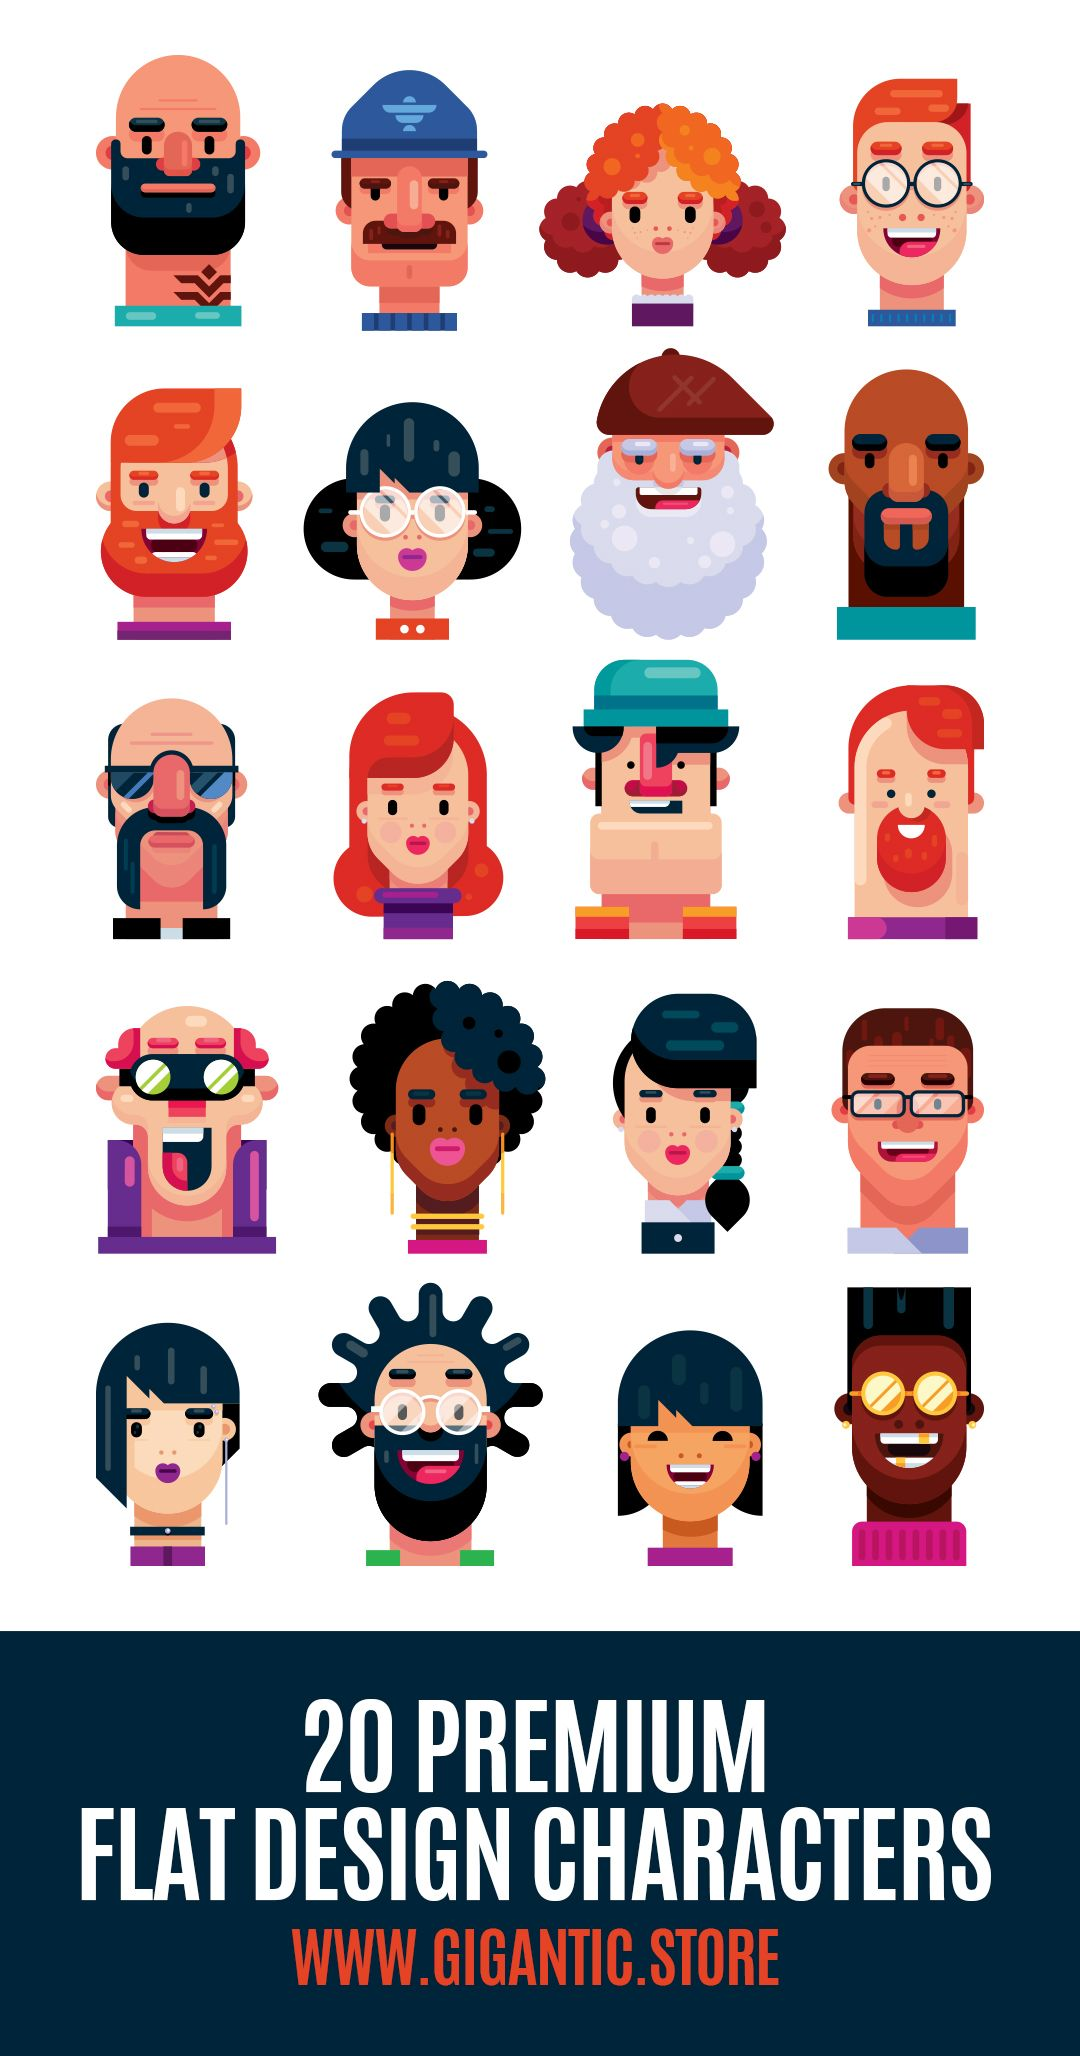 20 Premium Flat Design Characters